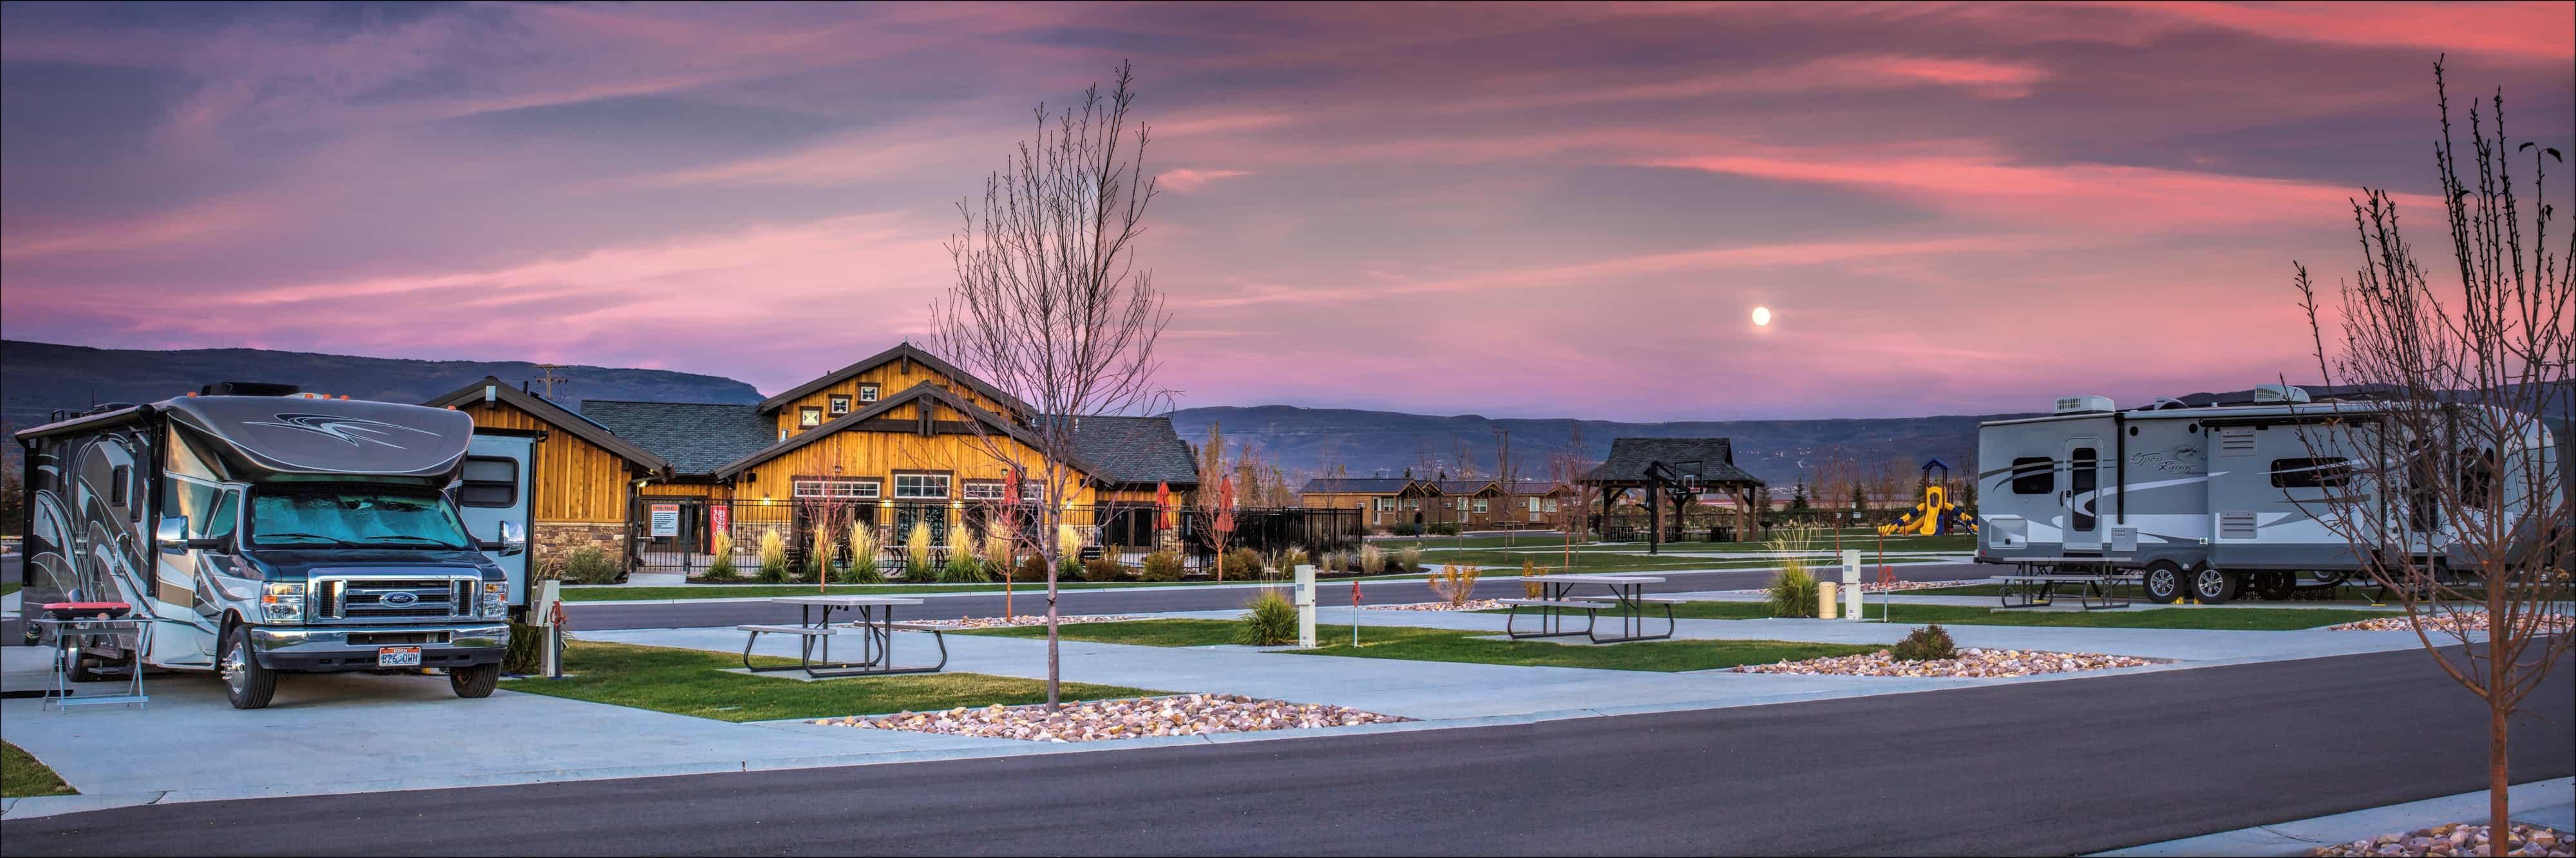 Mountain Valley Rv Resort Heber Utah S Finest Rv Resort